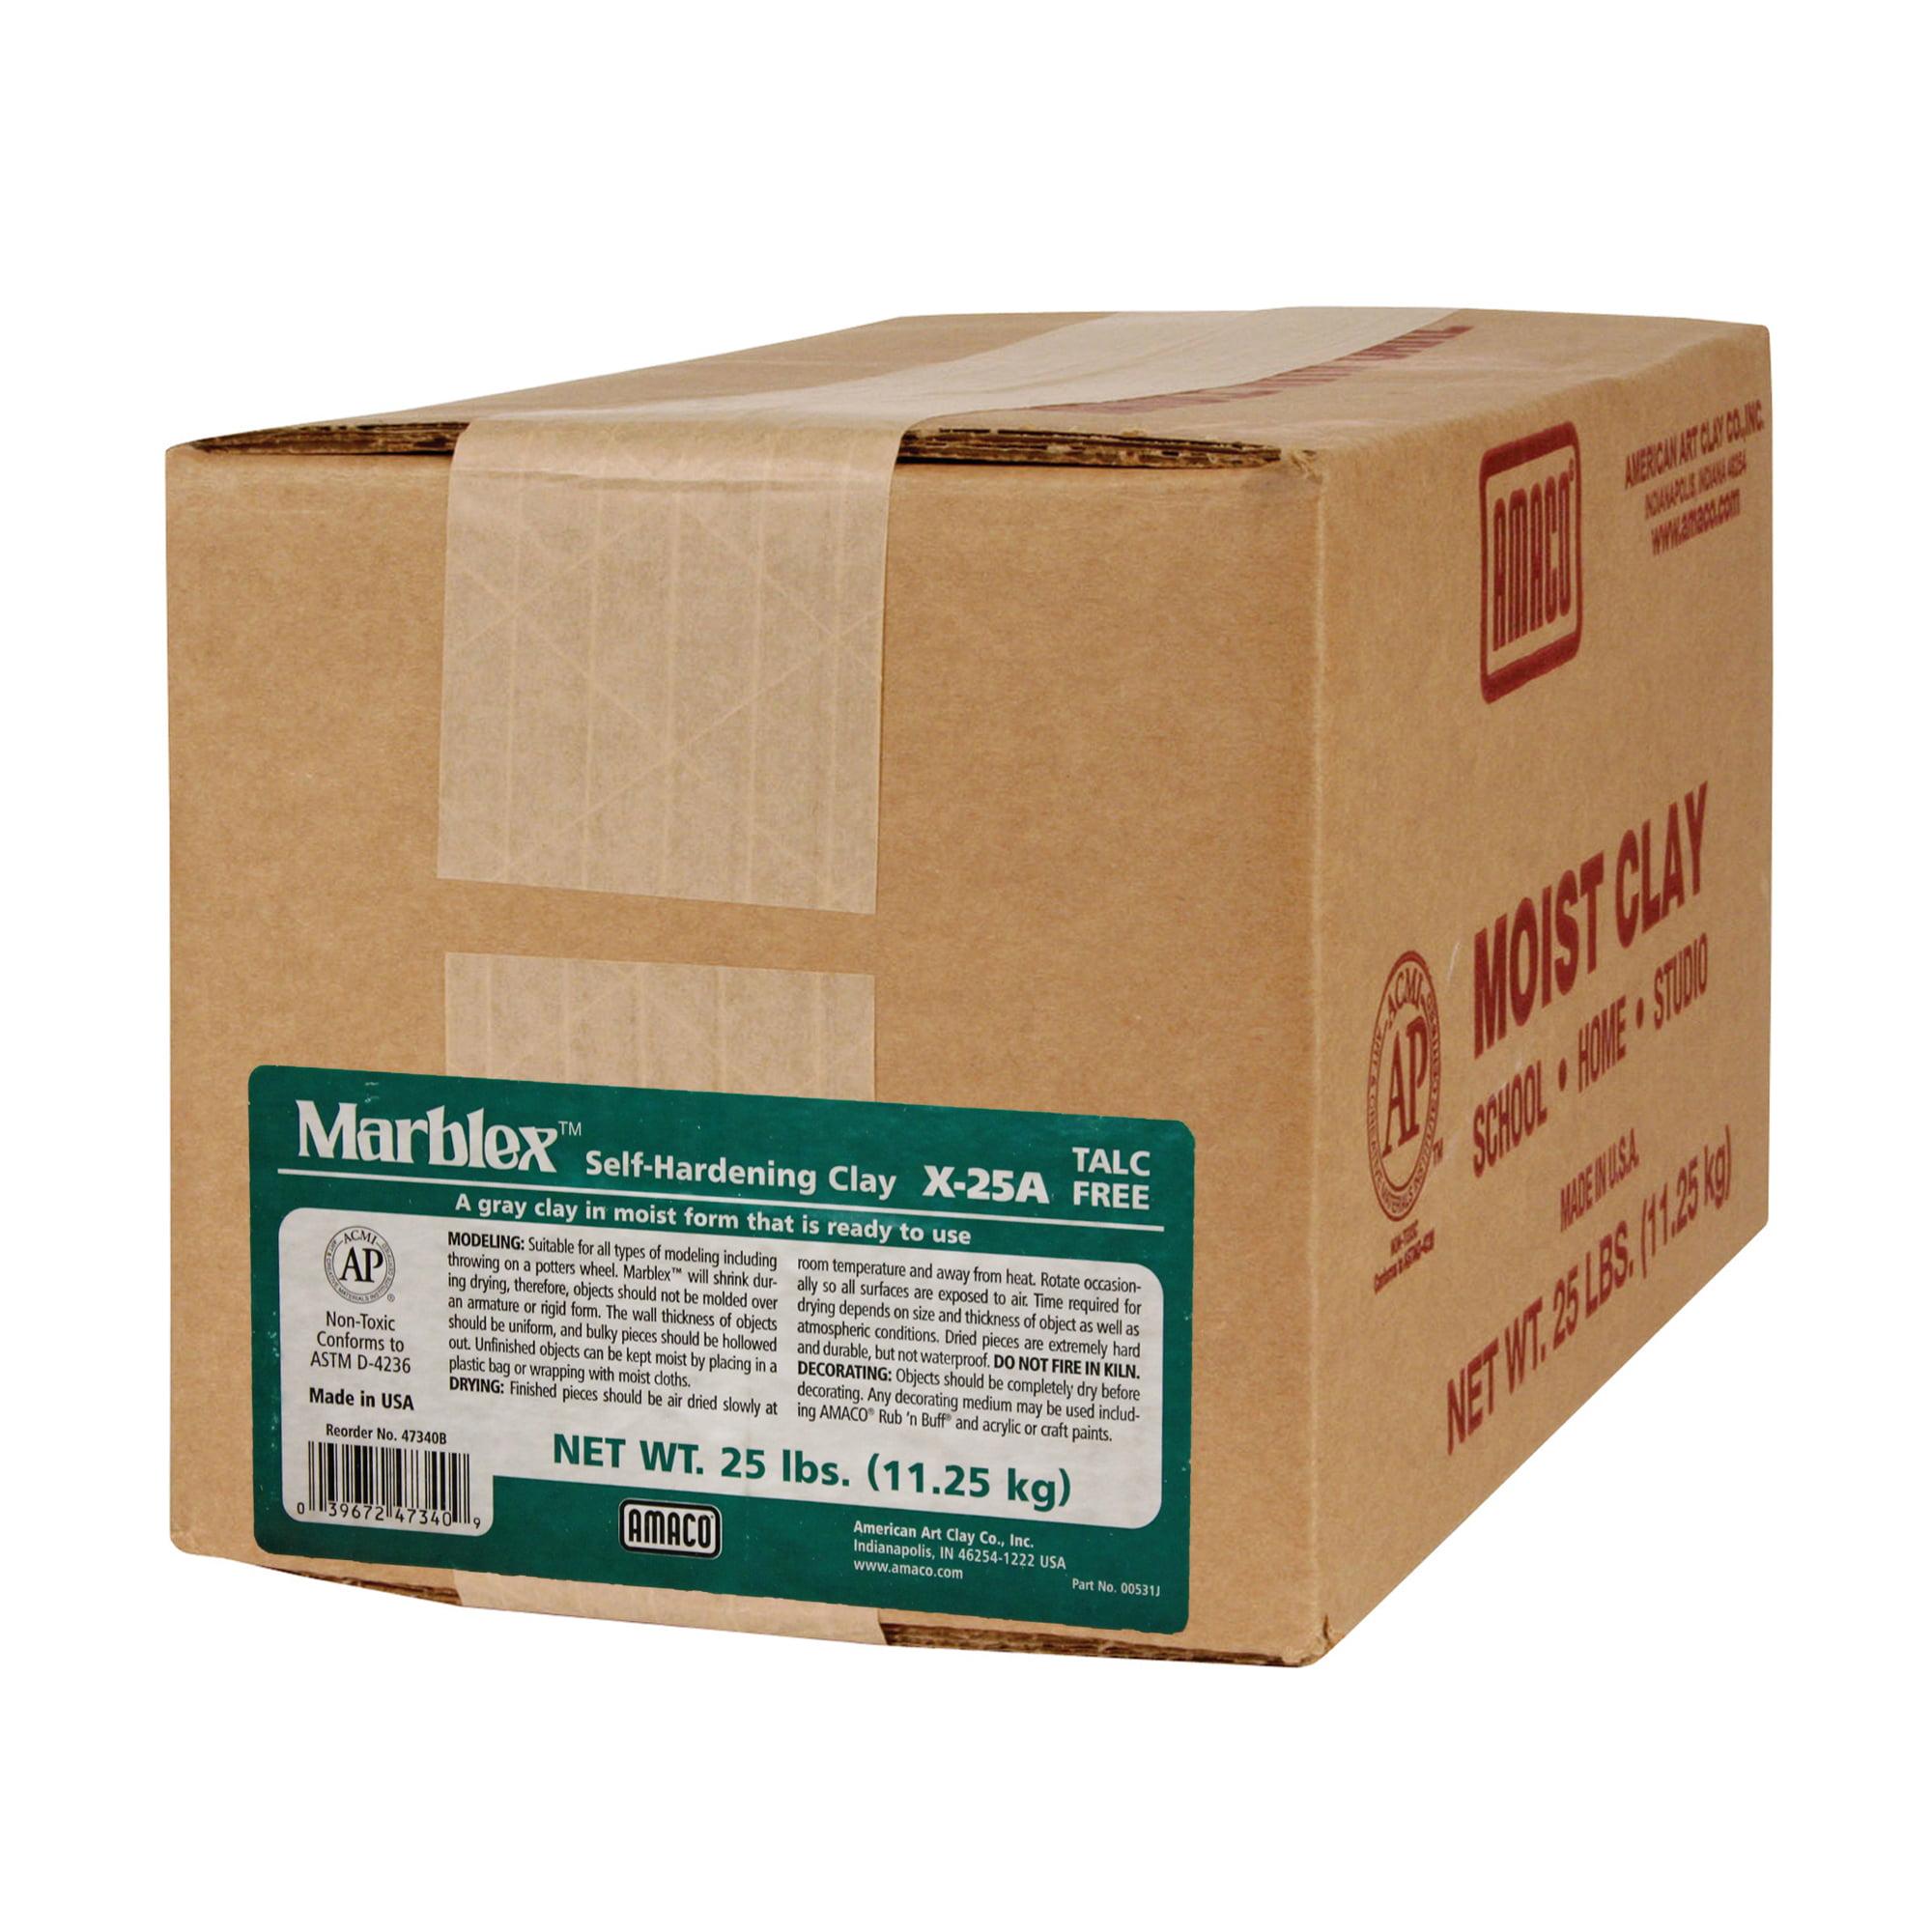 Marblex™ Self-Hardening Clay, 25 lbs.